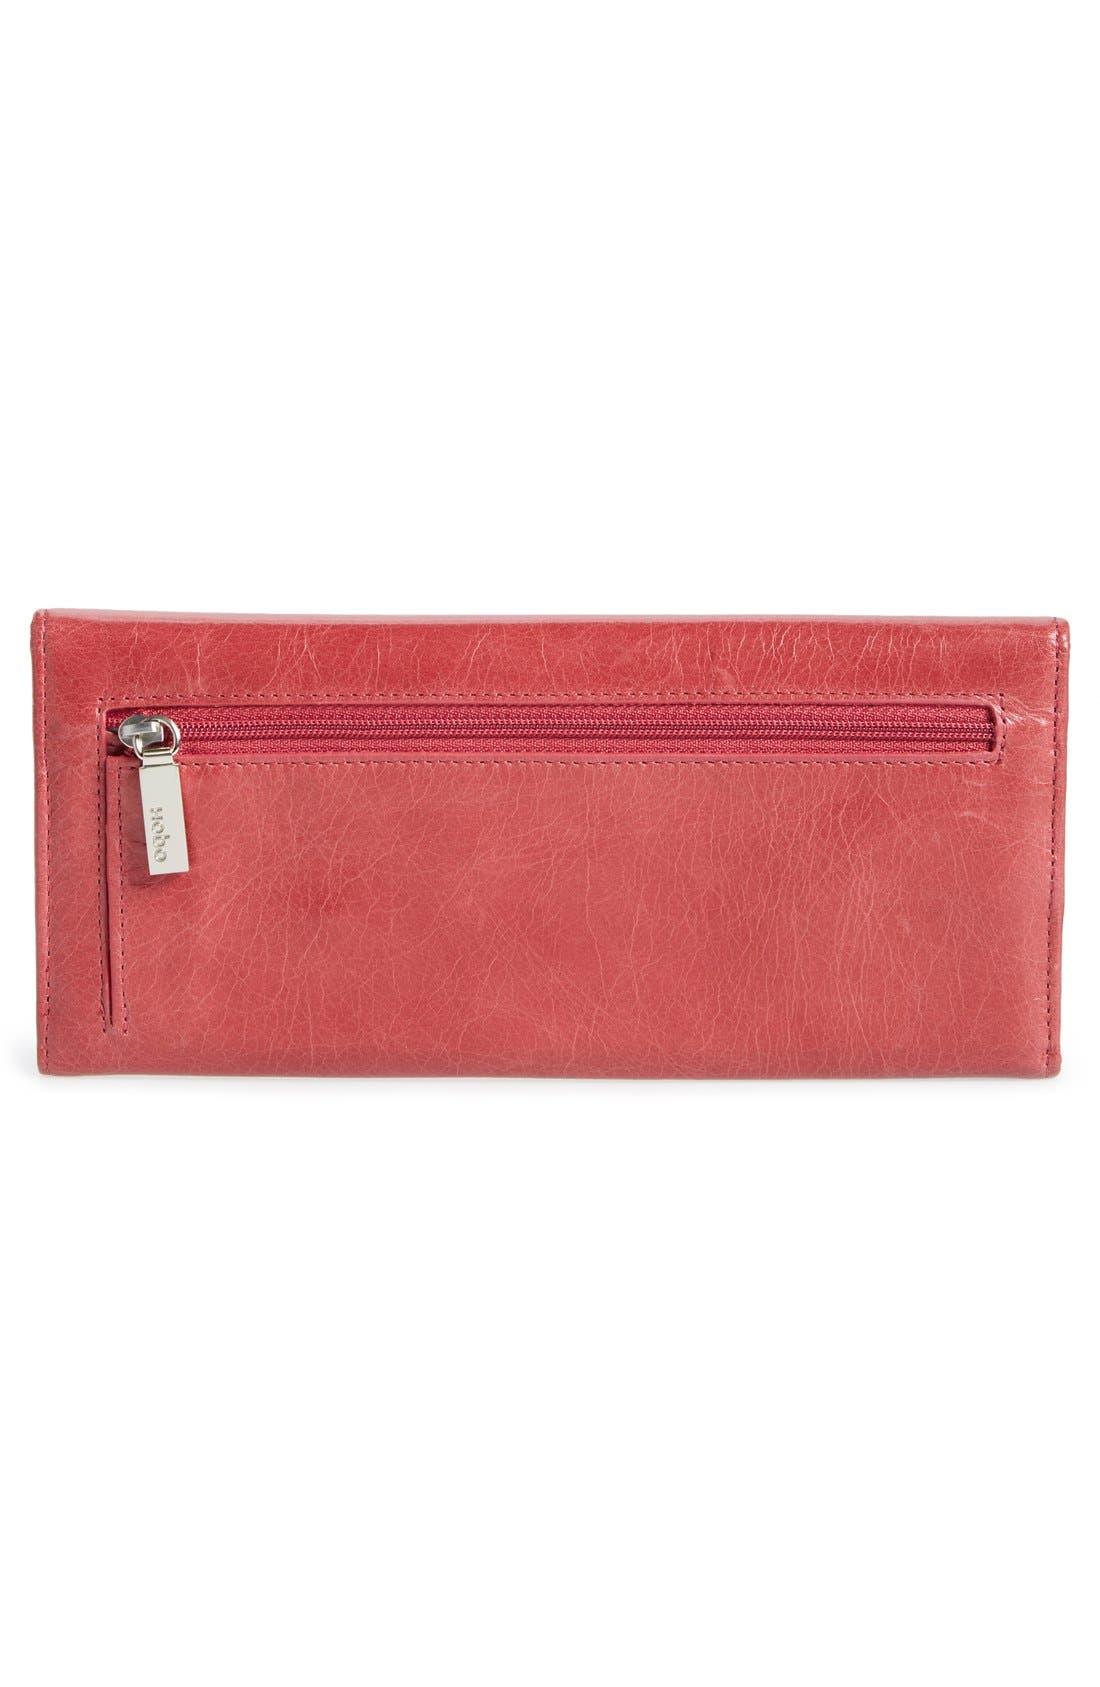 'Sadie' Leather Wallet,                             Alternate thumbnail 182, color,